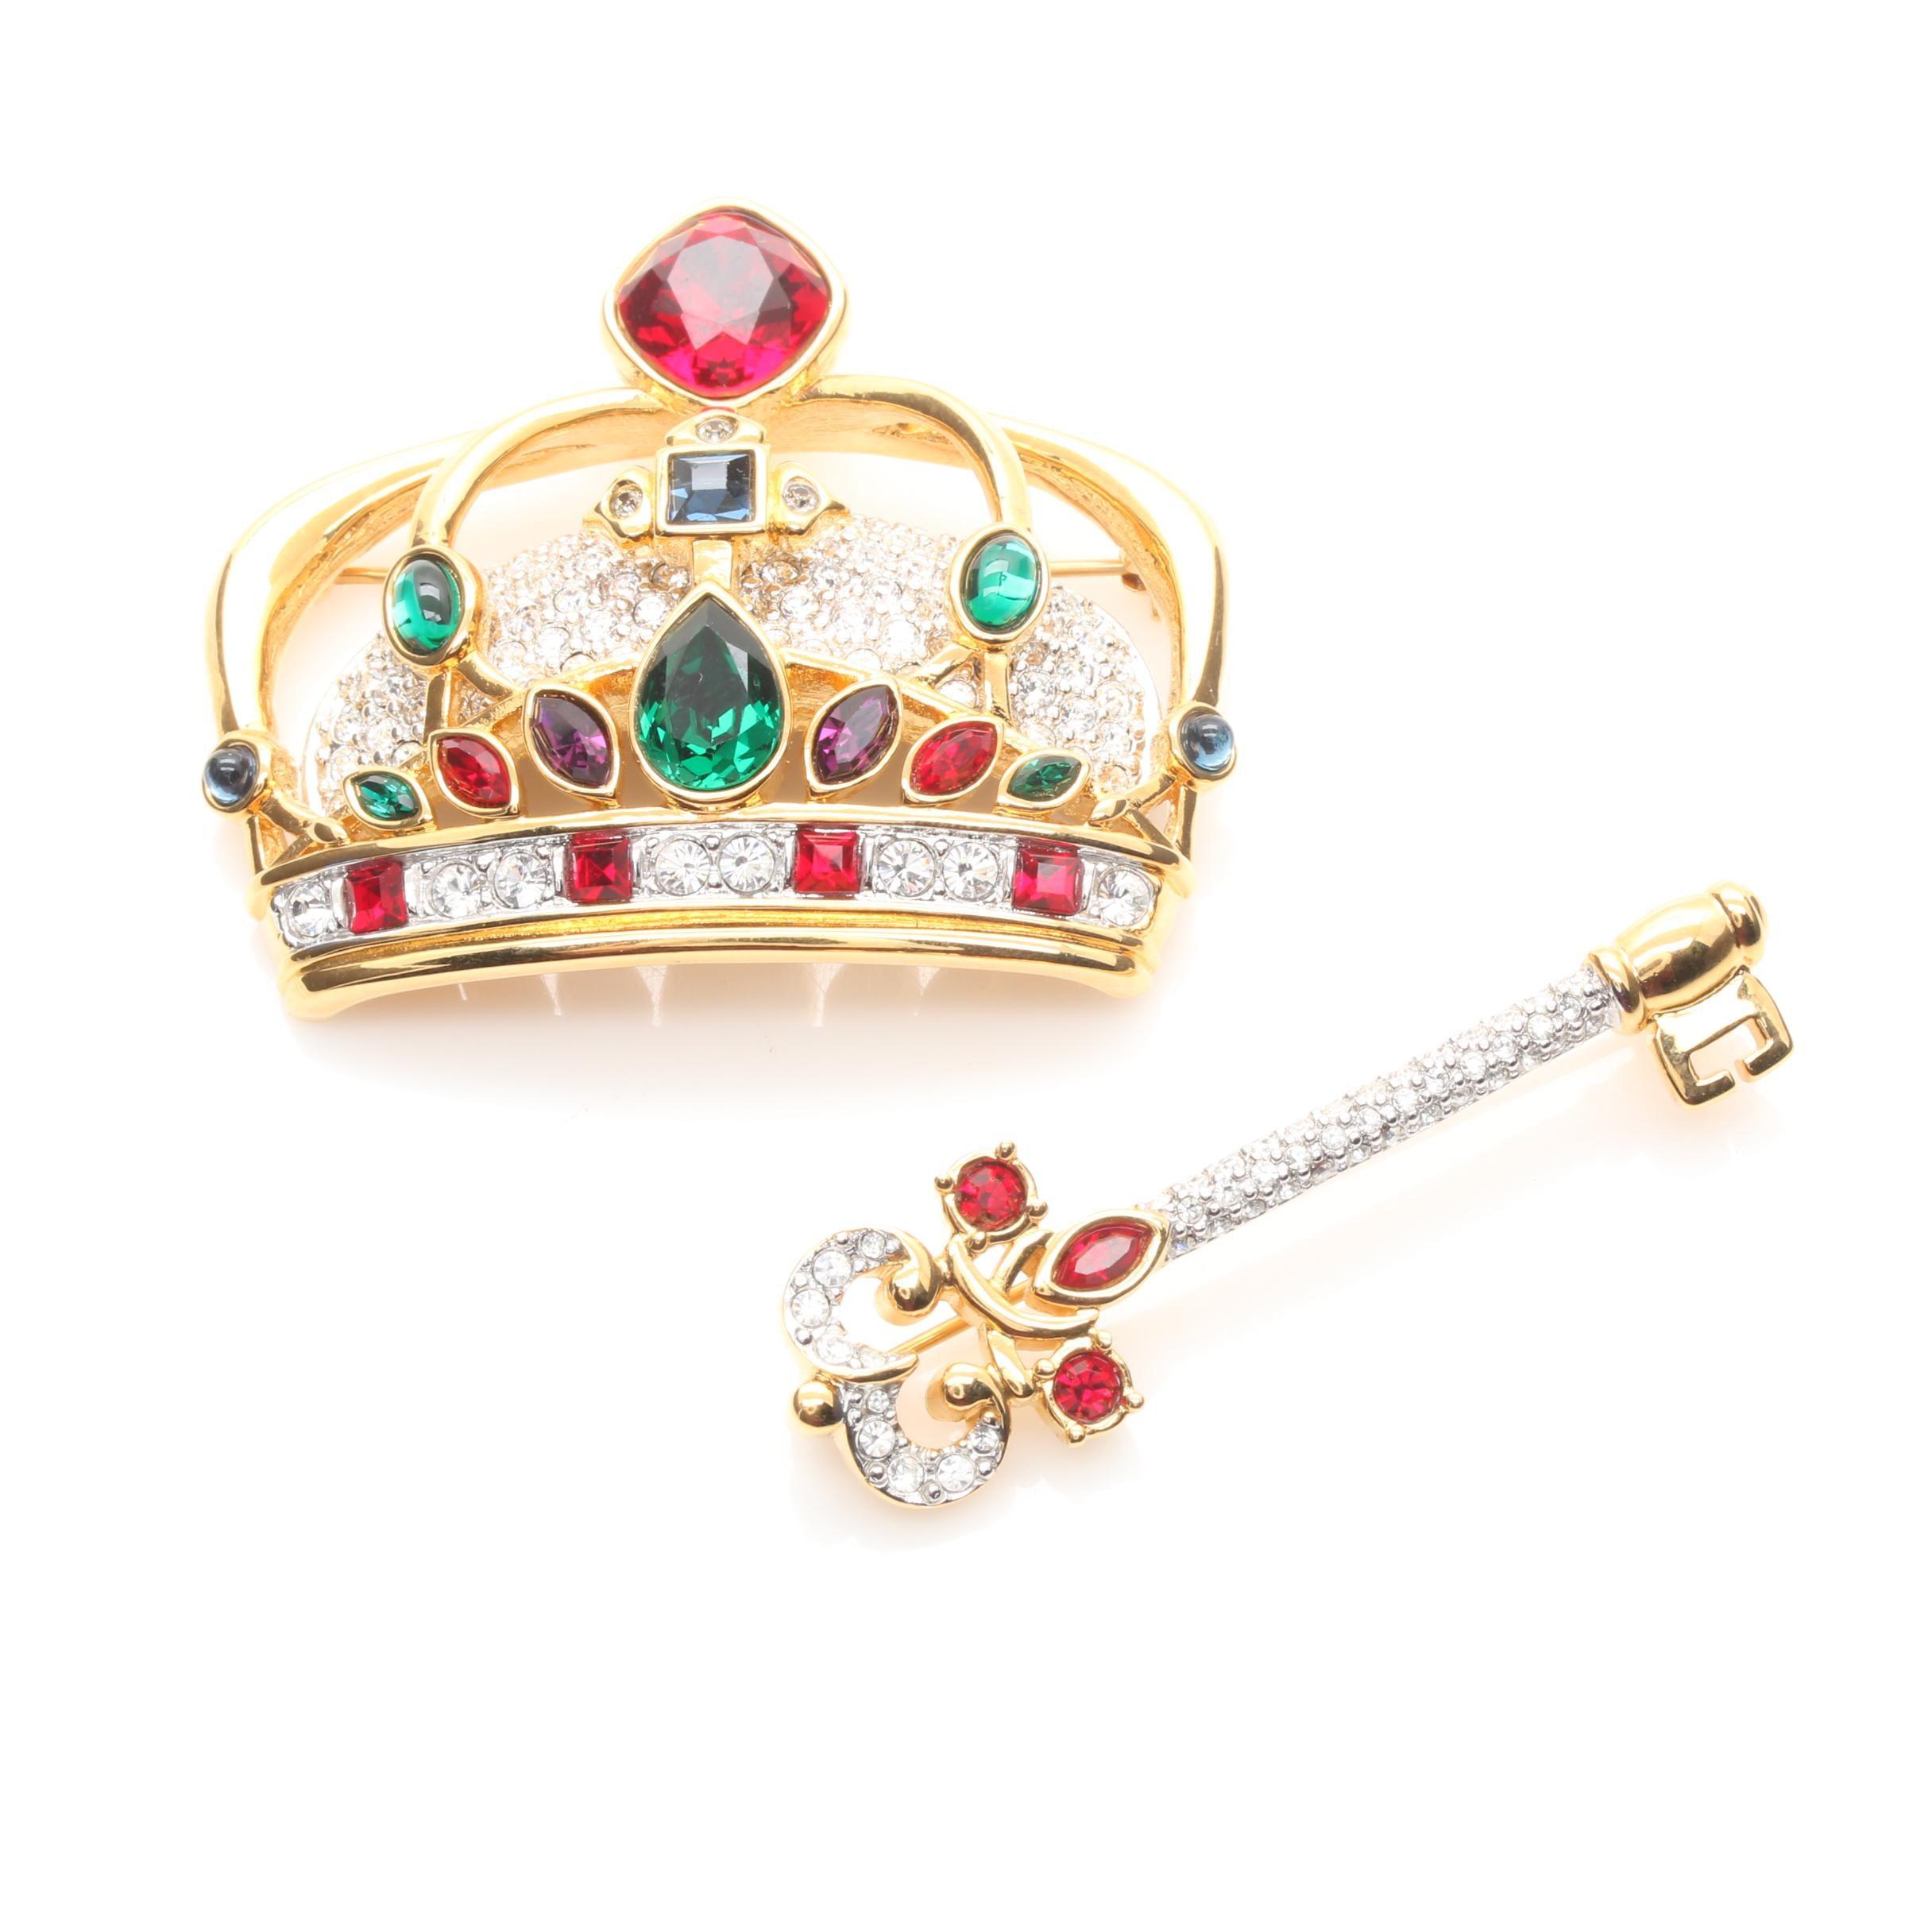 Swarovski Crown and Key Brooches